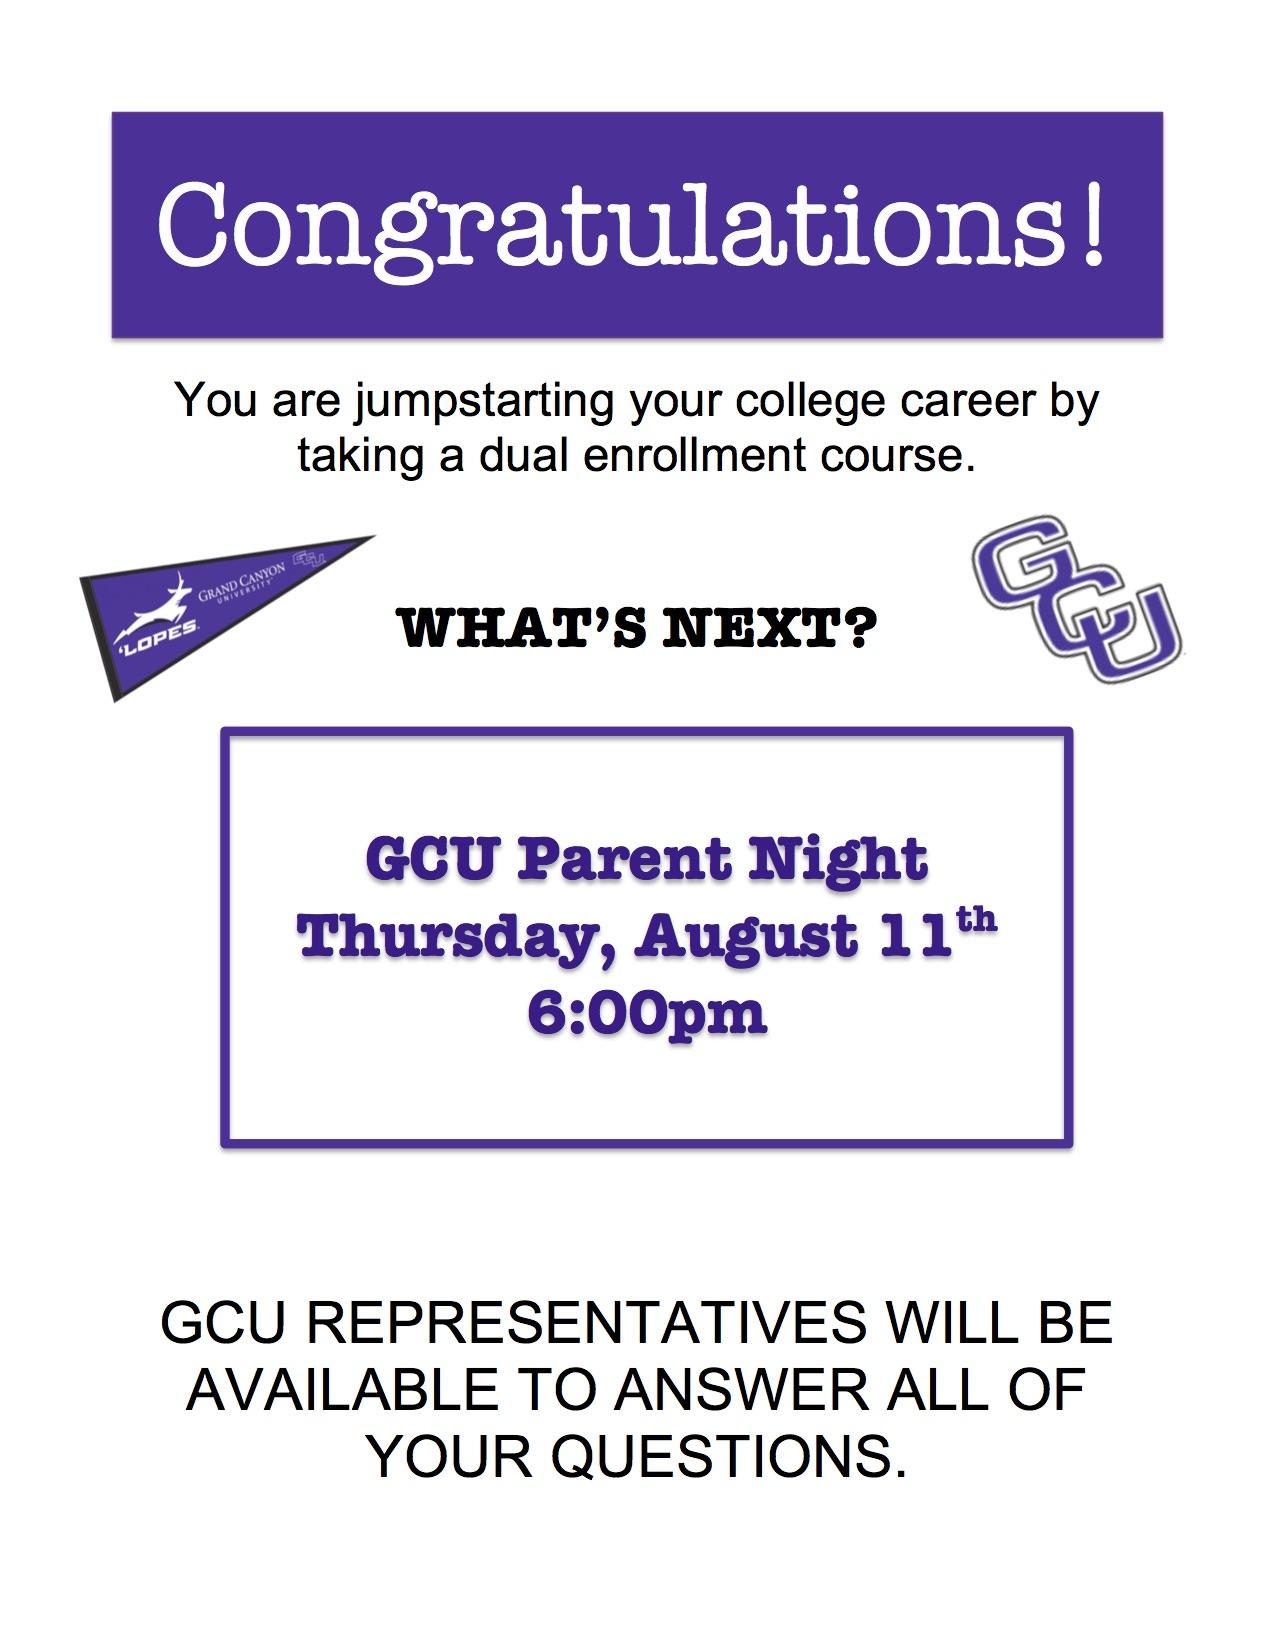 Gcu Parent Night Intended For 2021 2020 Gcu Academic Calendar